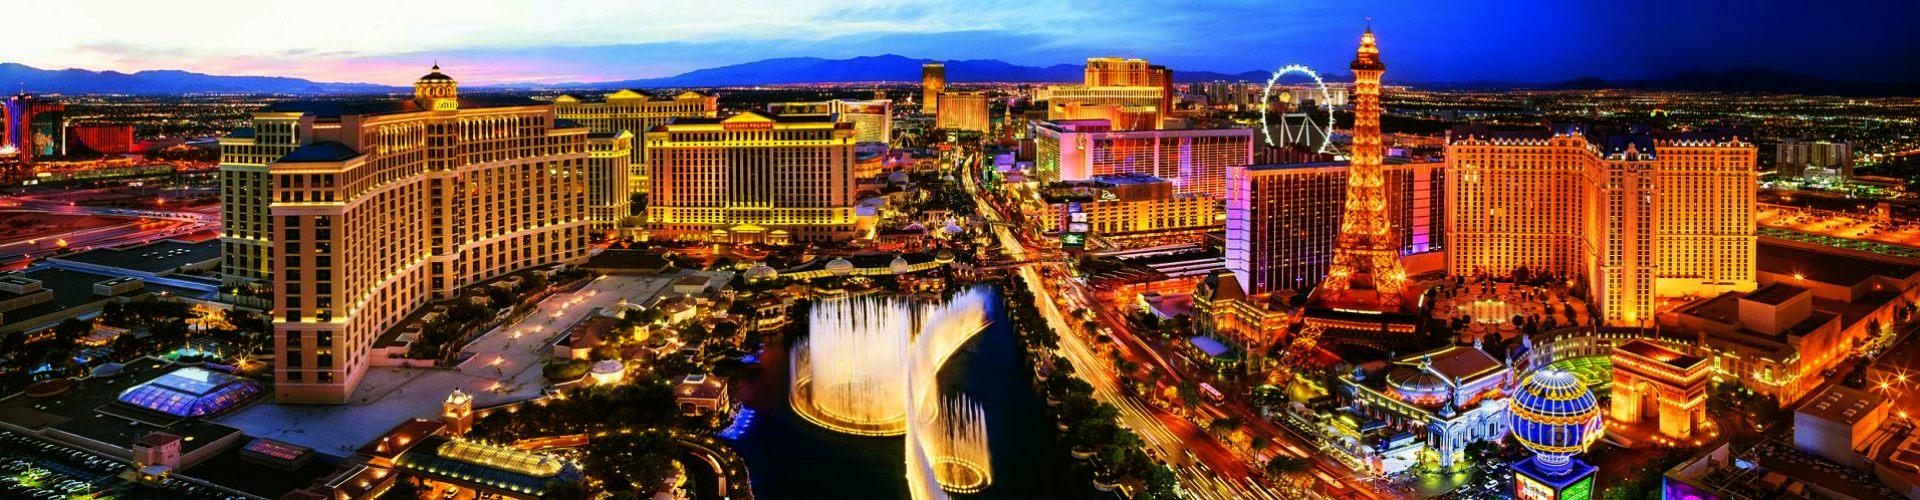 Las Vegas im Bundesstaat Nevada